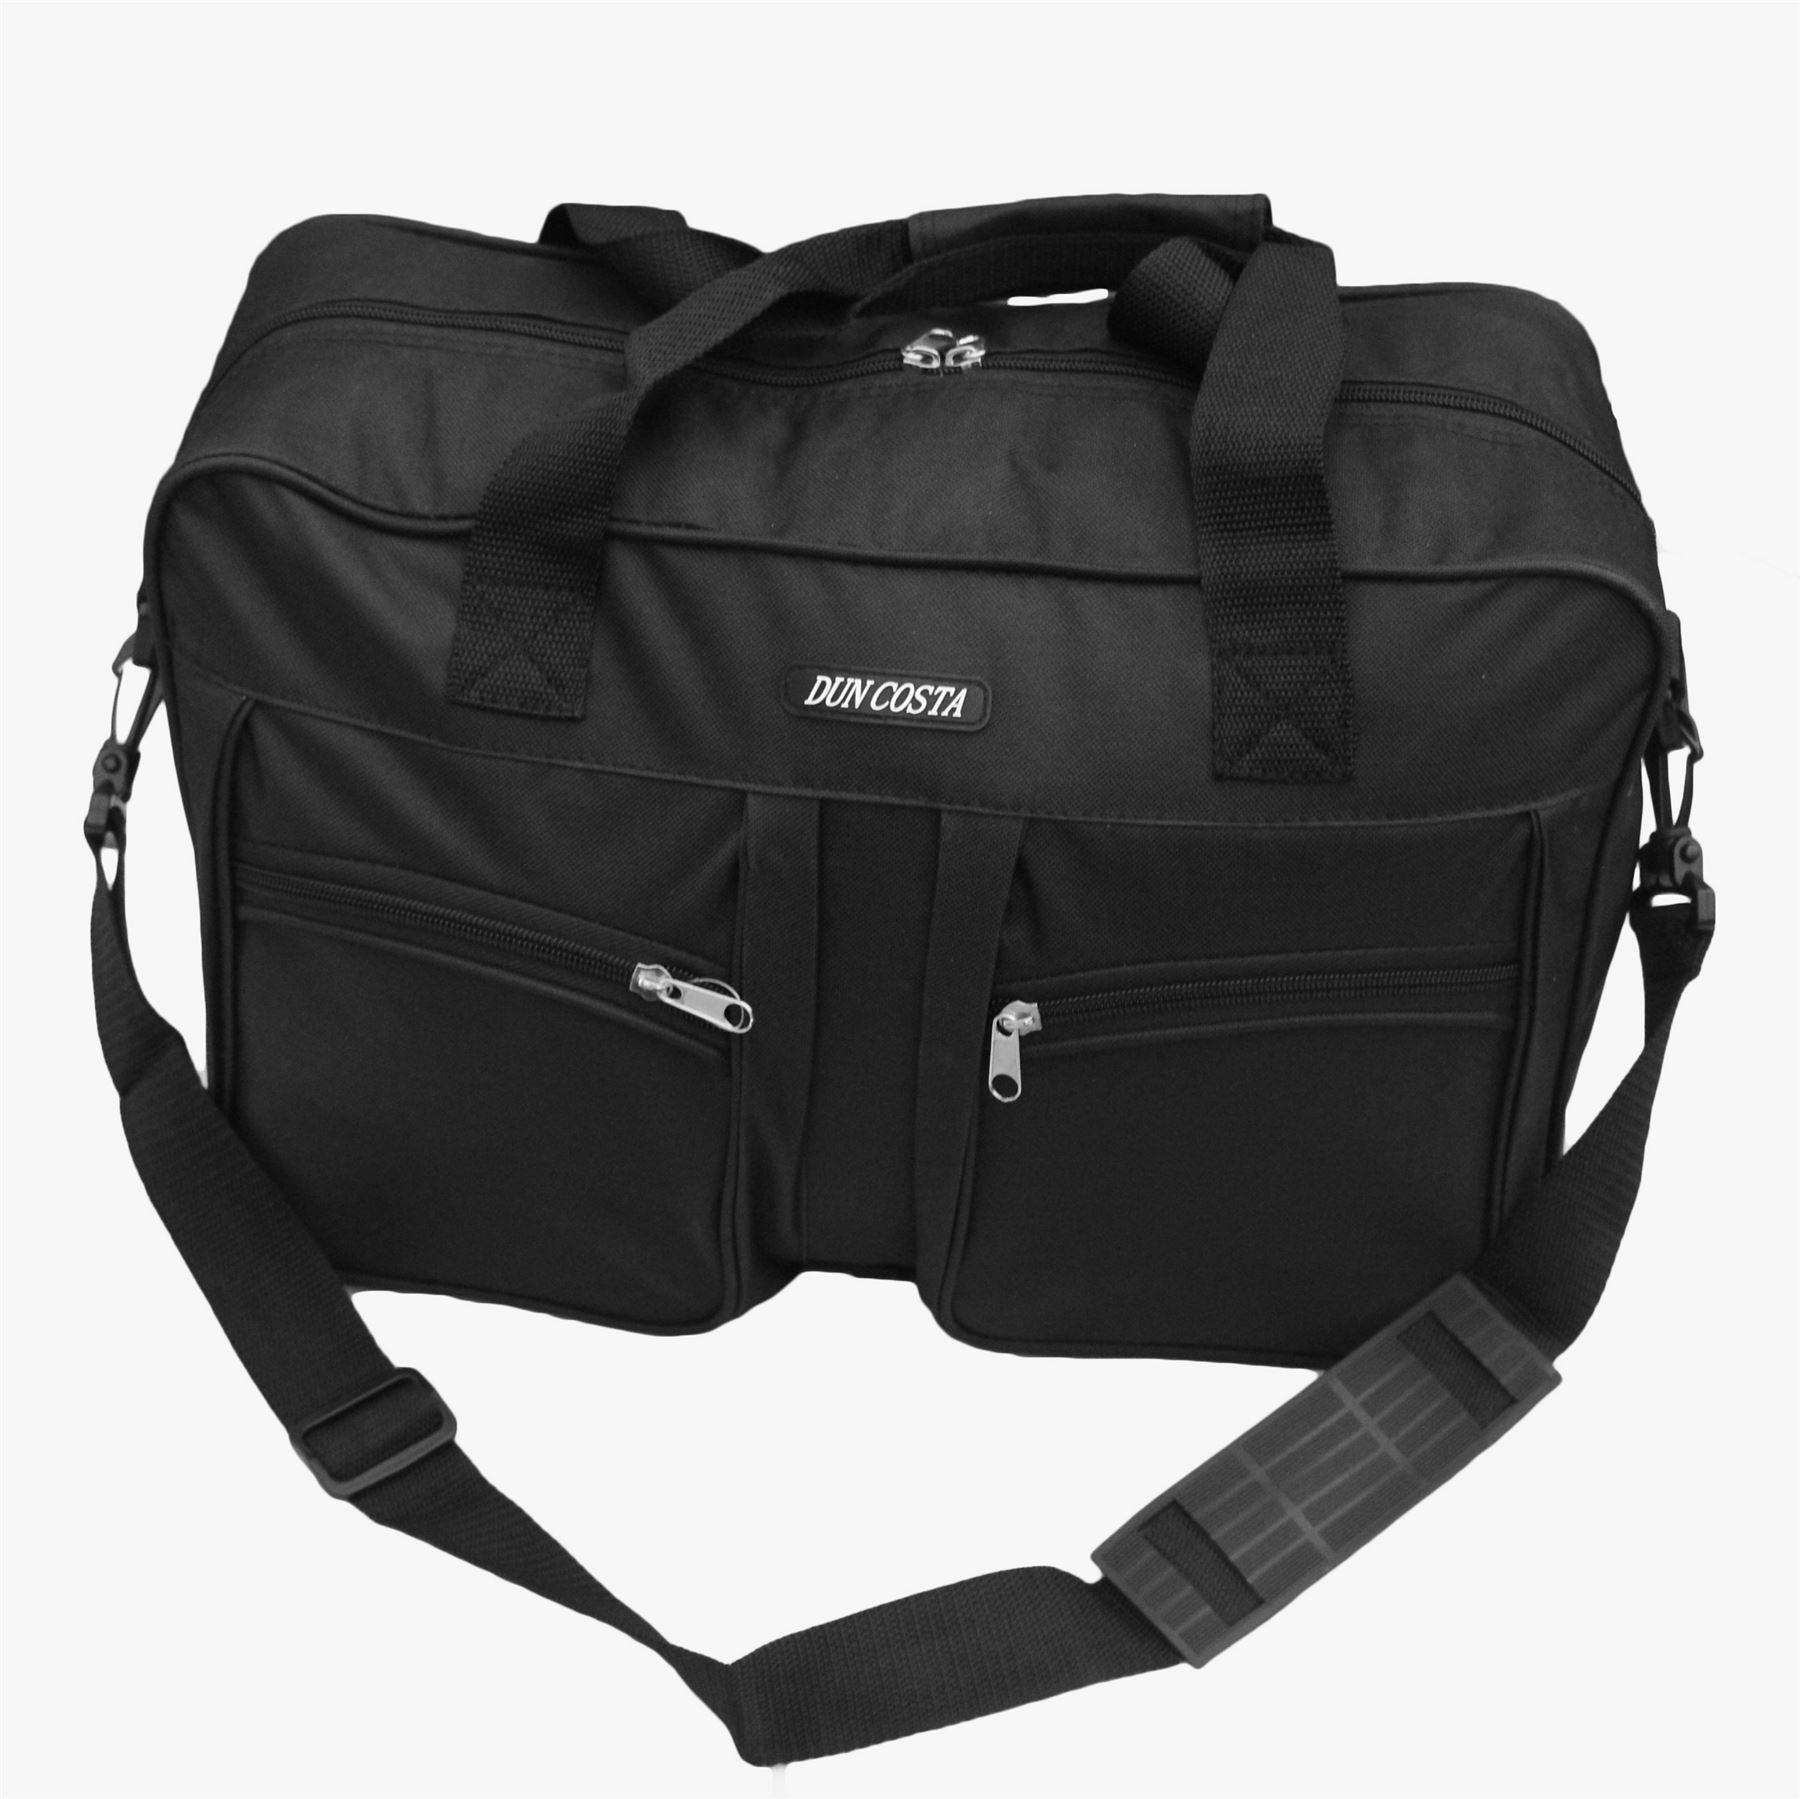 Ryanair Small Flight Hand Luggage Travel Cabin Shoulder Flight Bag ... 2f4f51a13c7d9